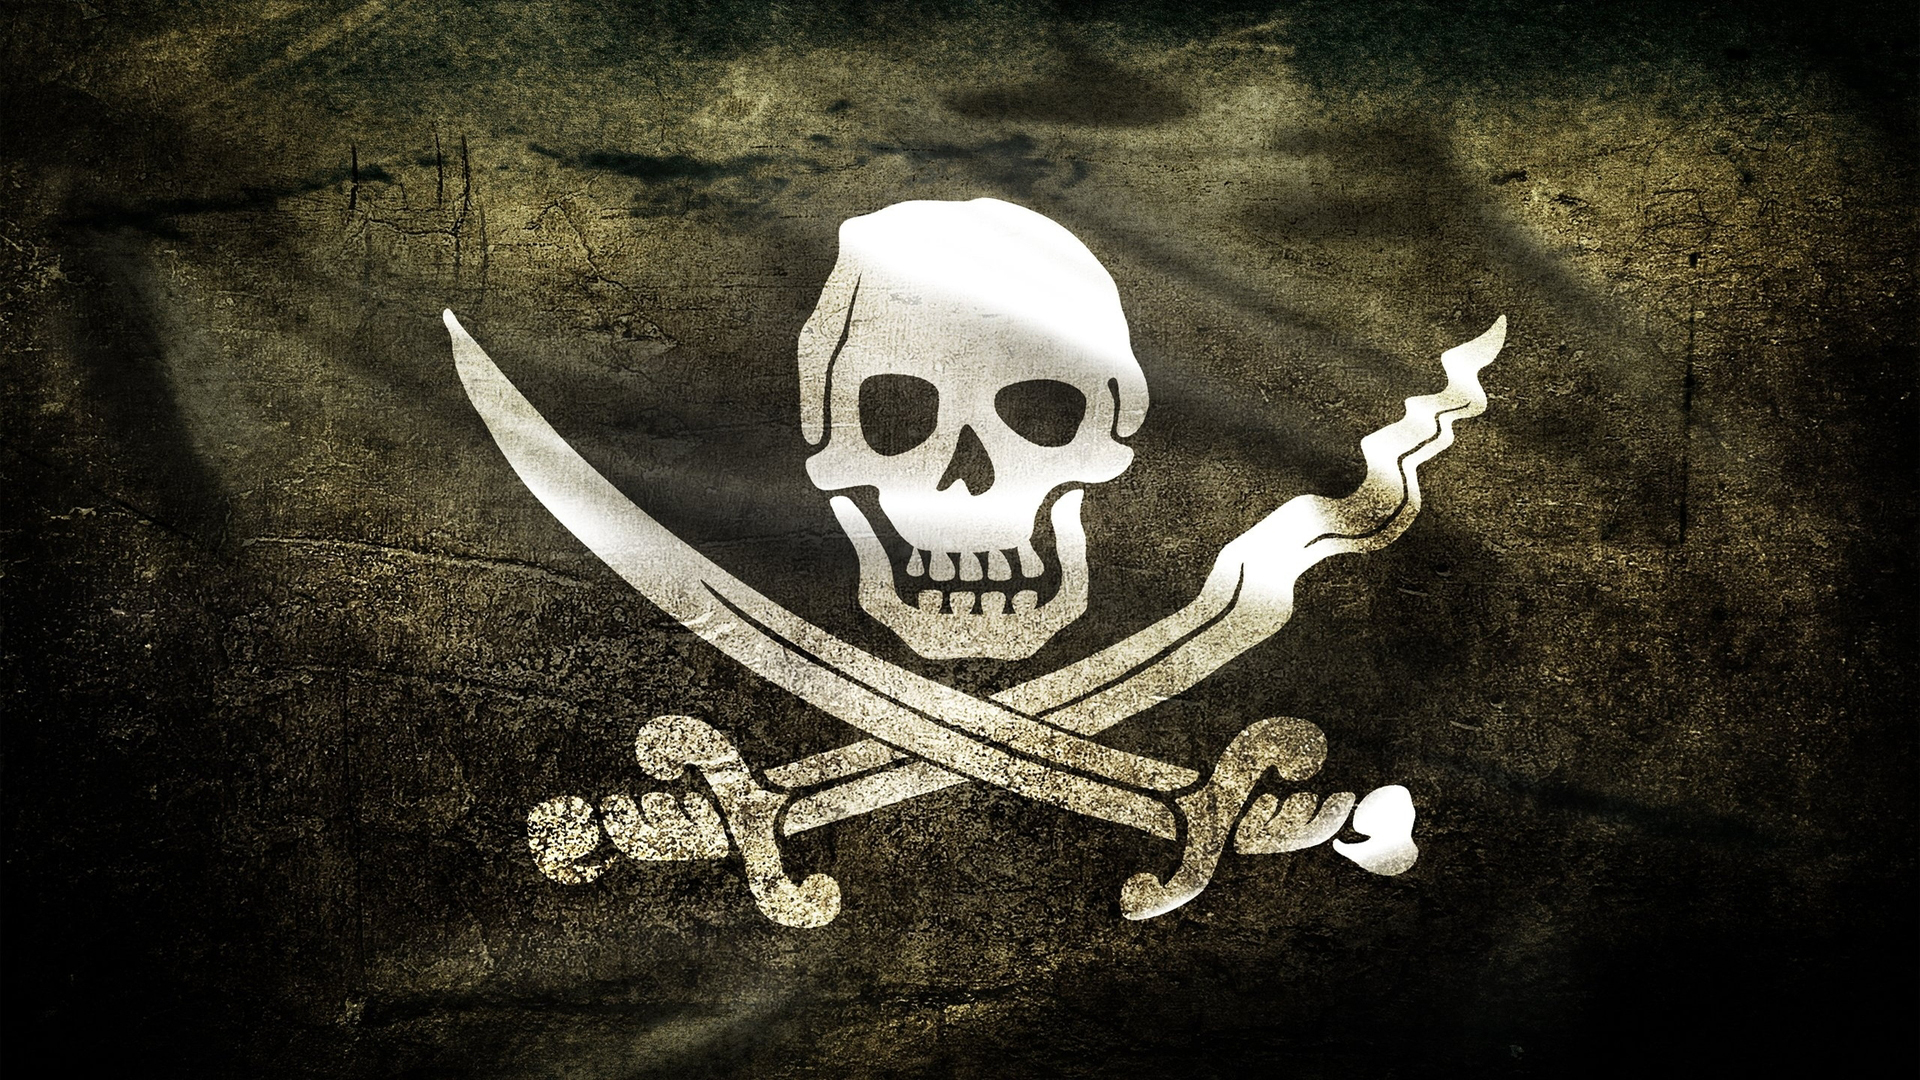 71 Skull And Crossbones Wallpapers On Wallpapersafari